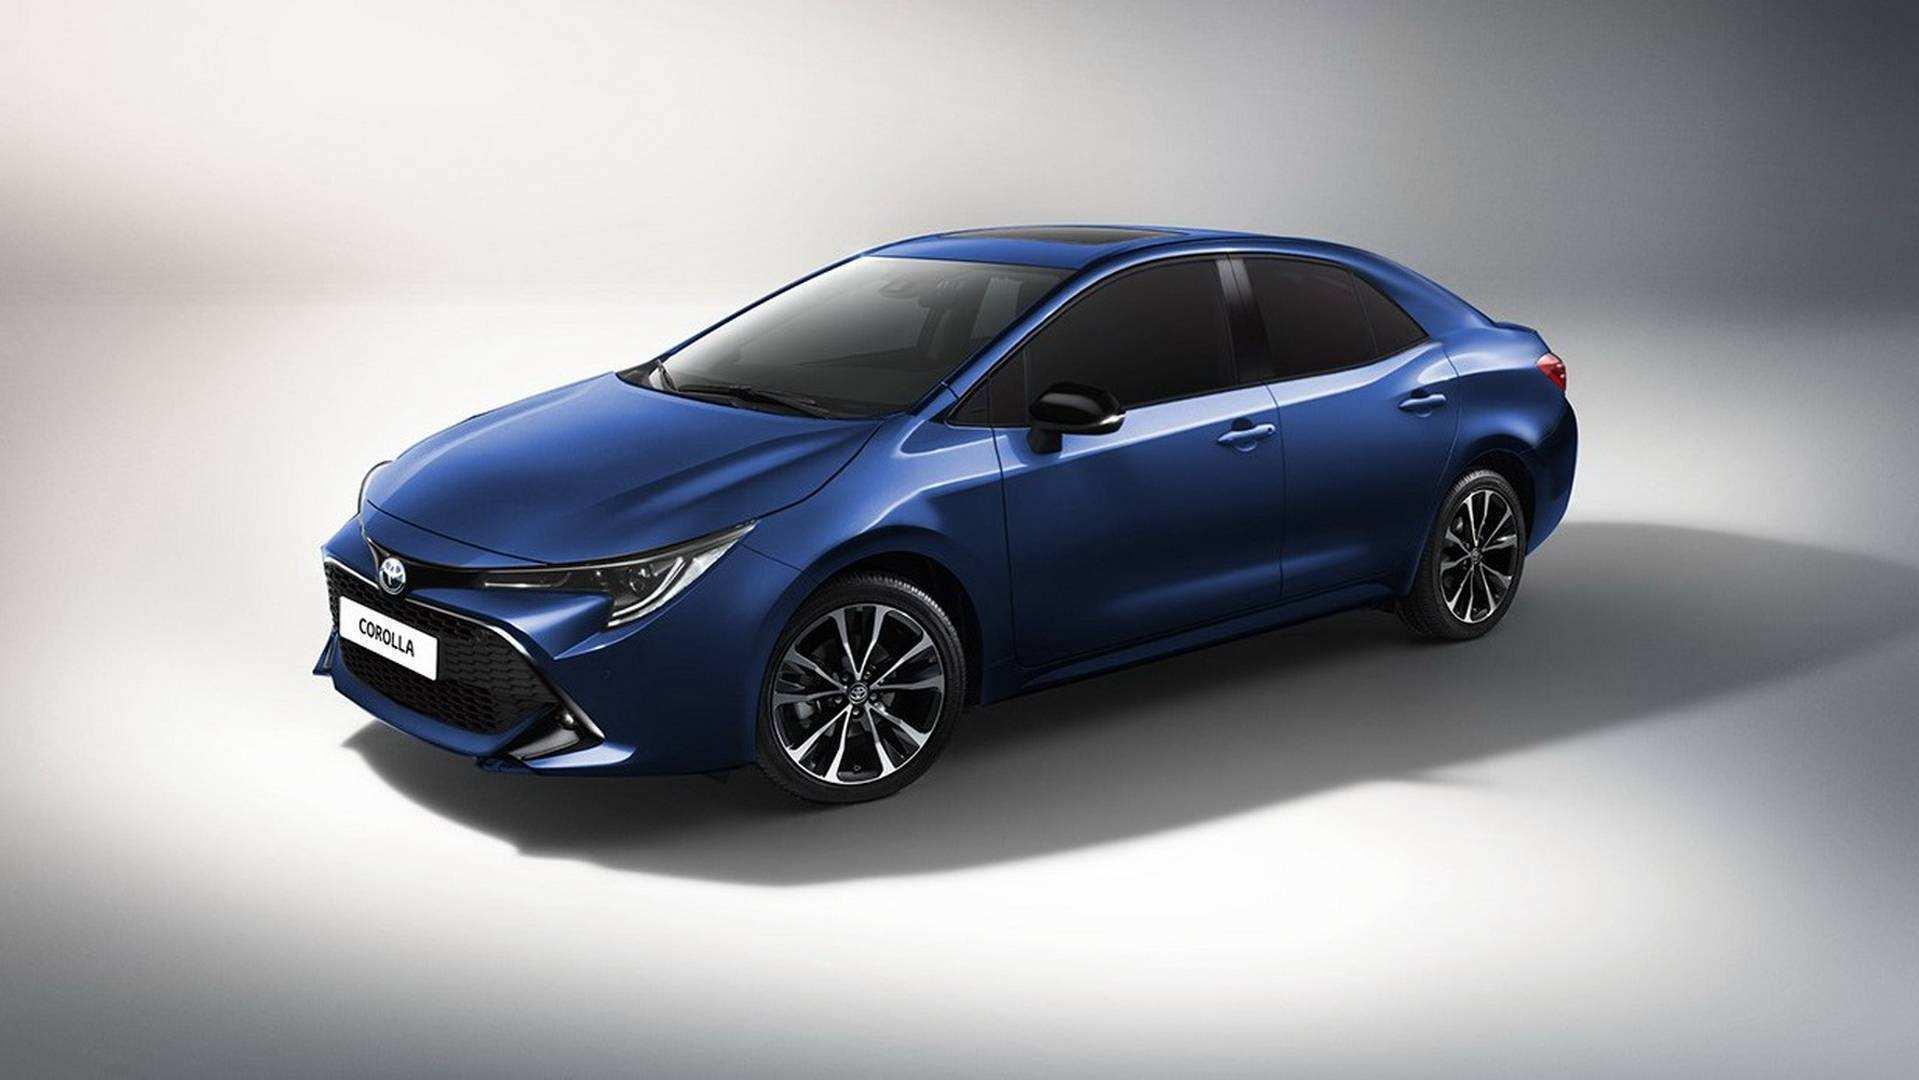 89 New Hatchback Toyota 2020 Release for Hatchback Toyota 2020